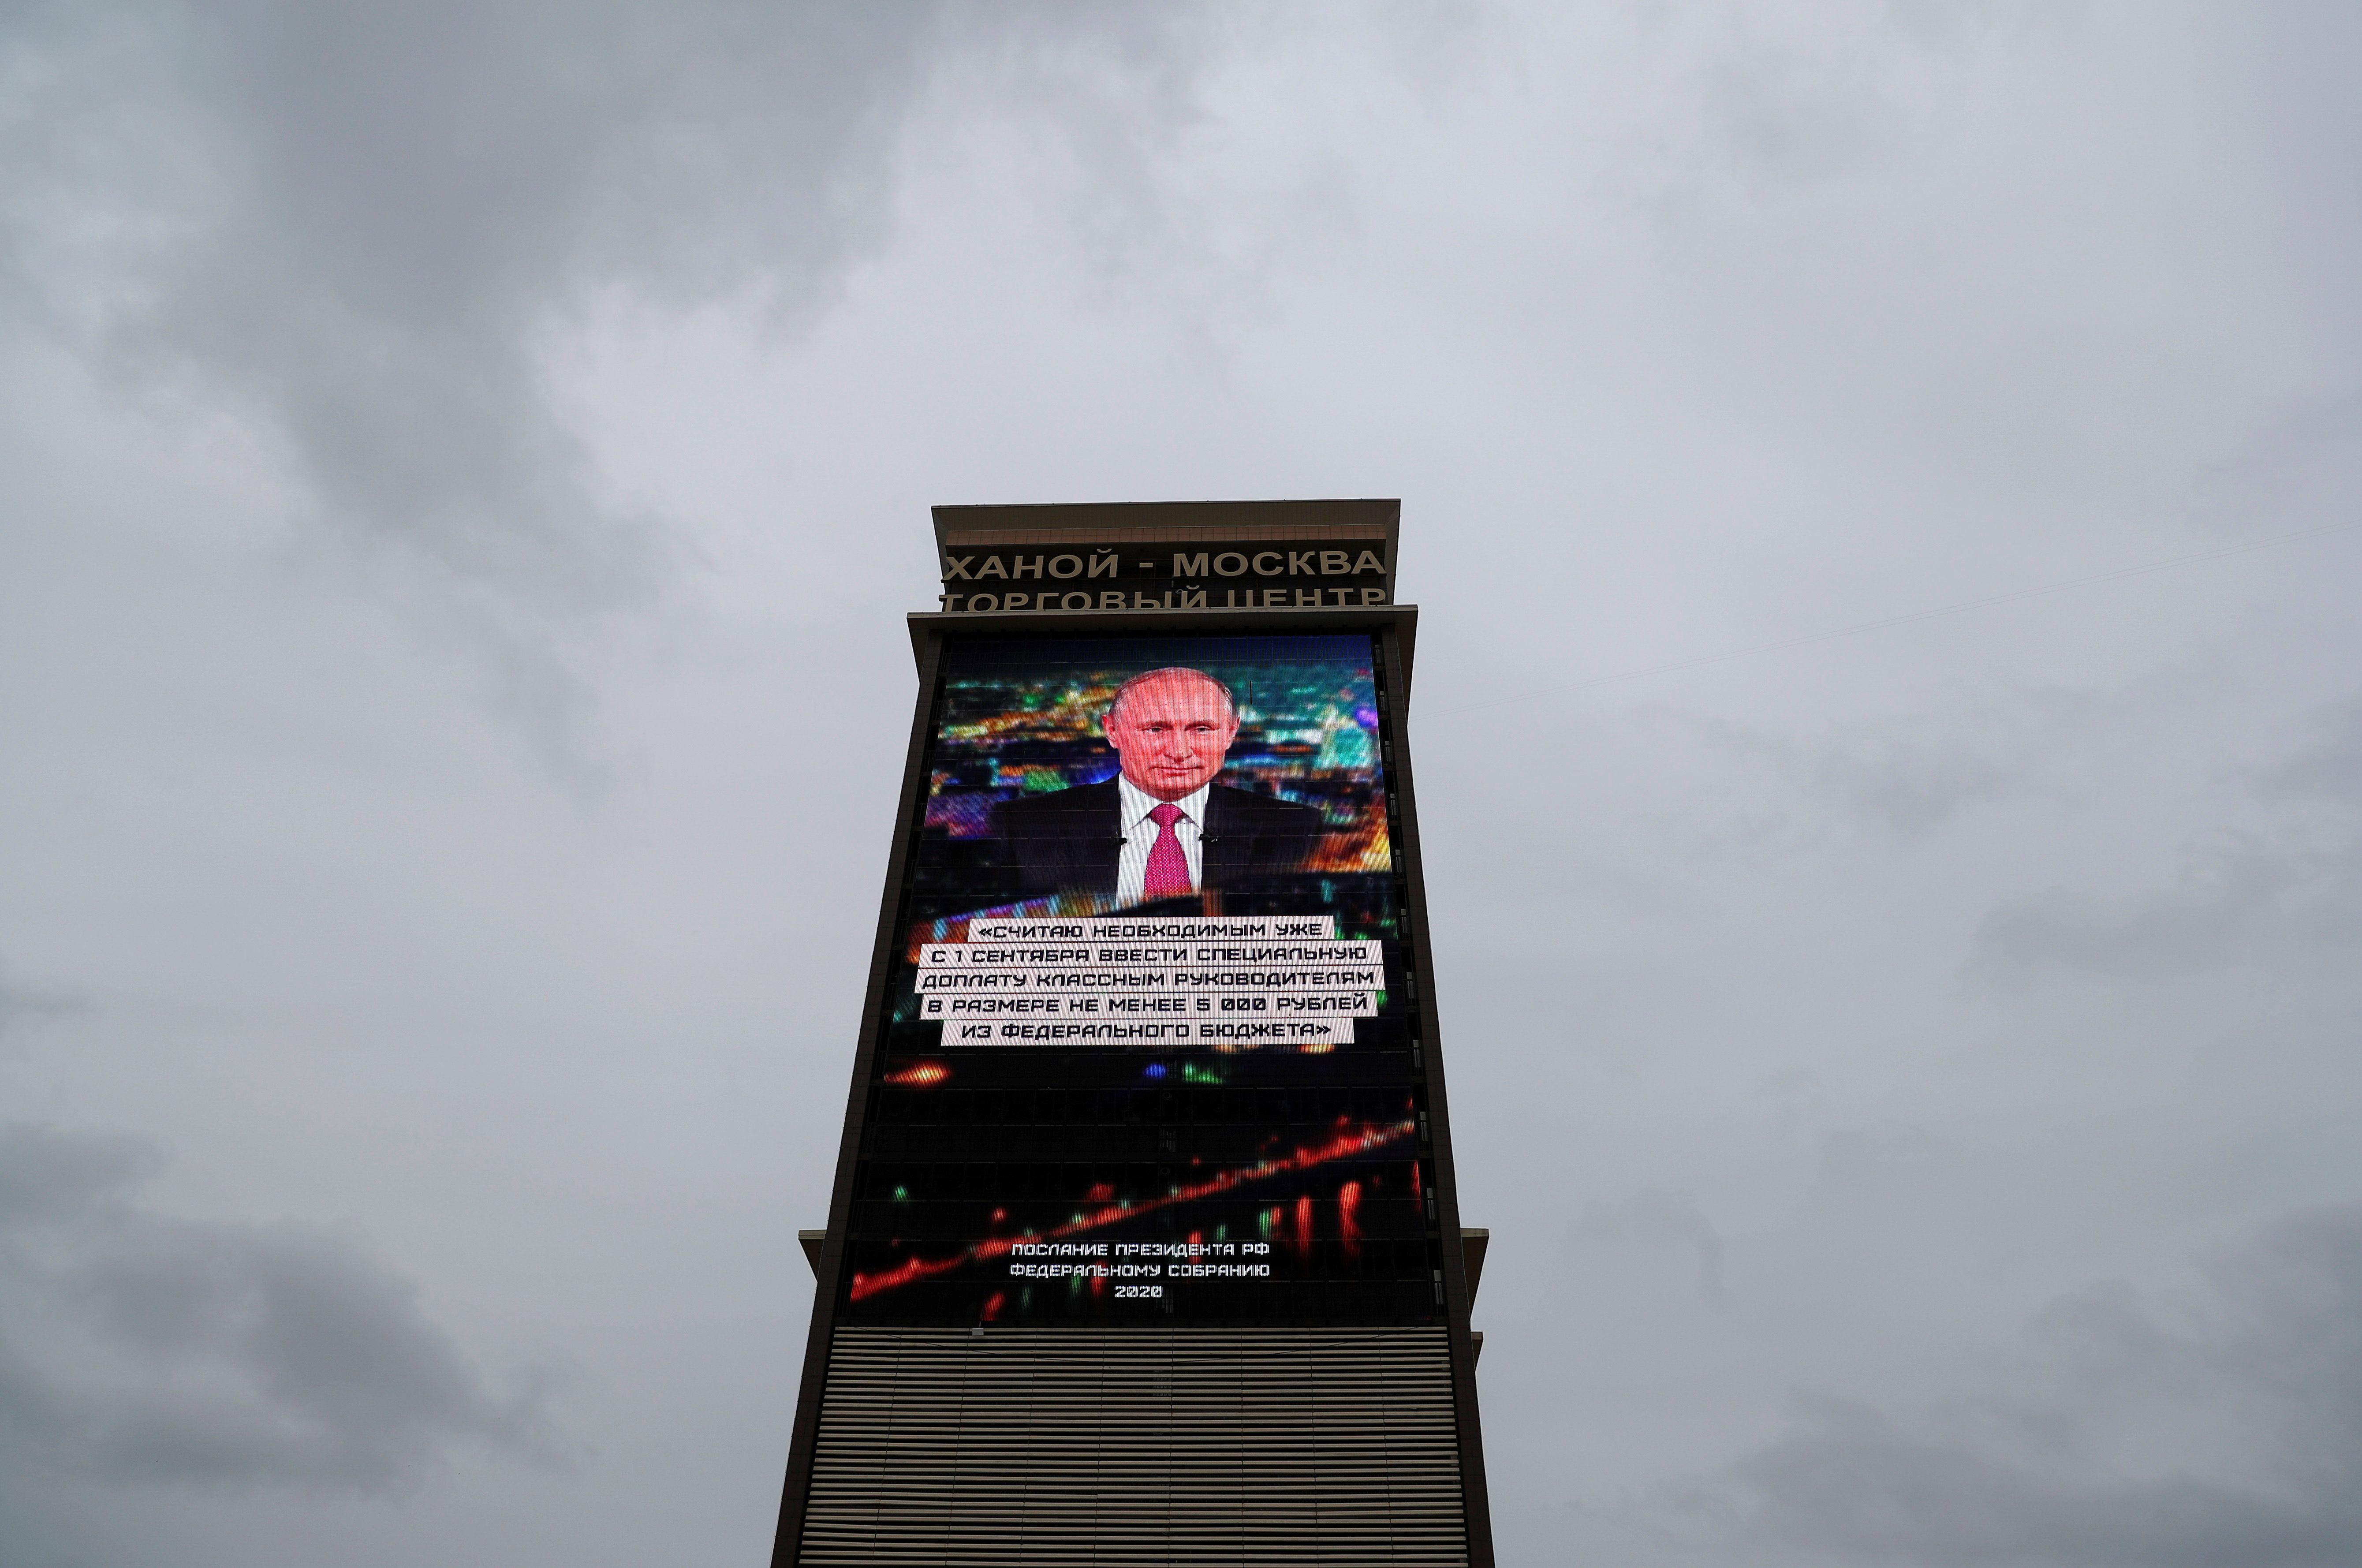 Putin's problem and Russia's future